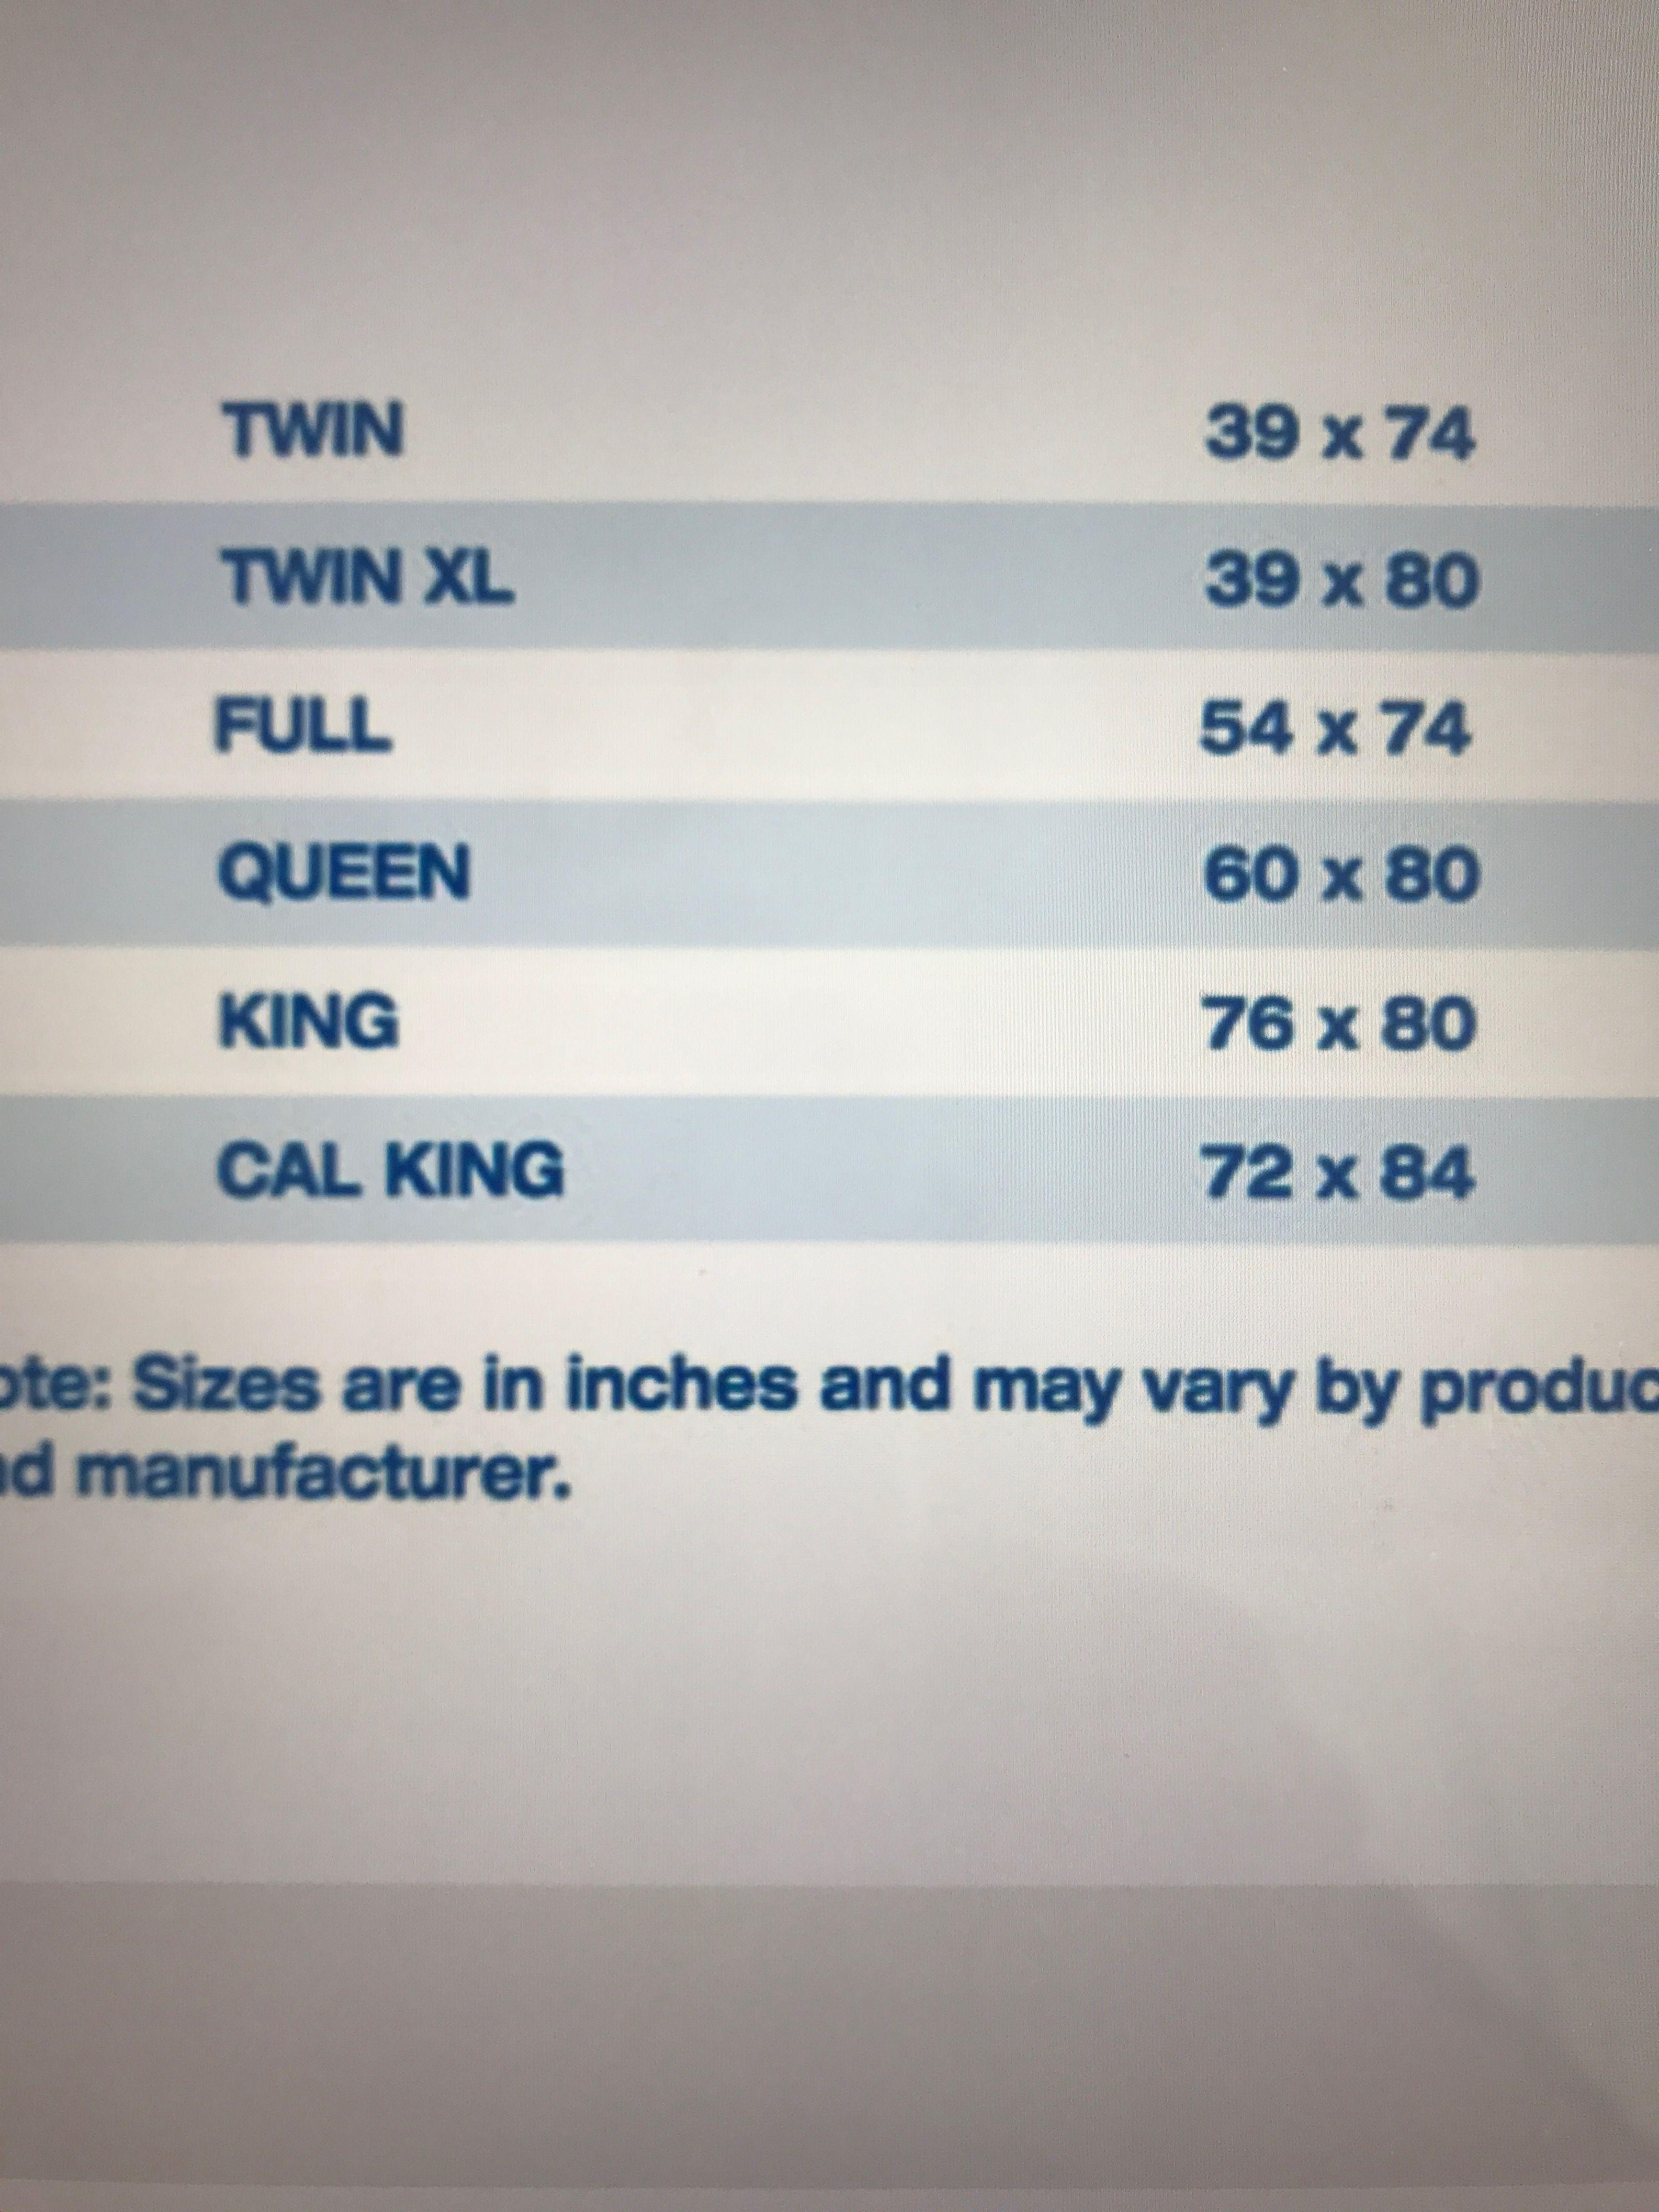 Mattress sizes Mattress sizes, Design guide, Twin xl